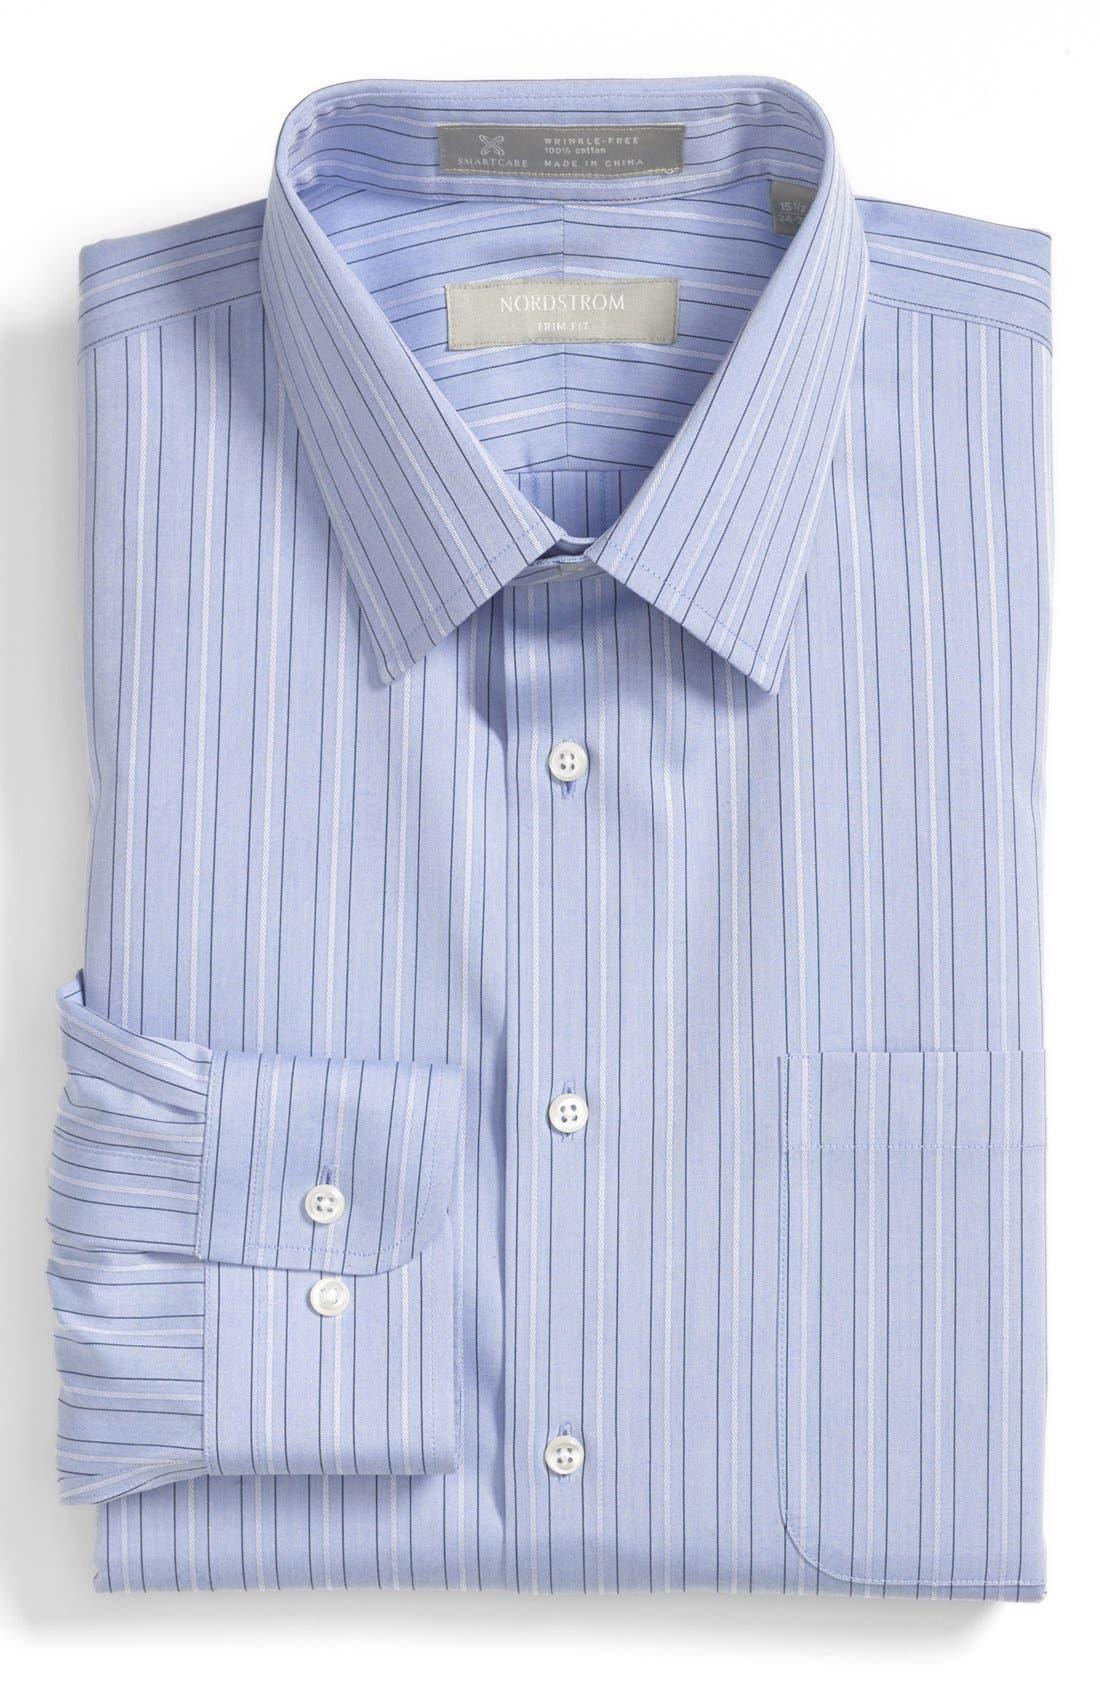 Alternate Image 1 Selected - Nordstrom Smartcare™ Trim Fit Stripe Non-Iron Dress Shirt